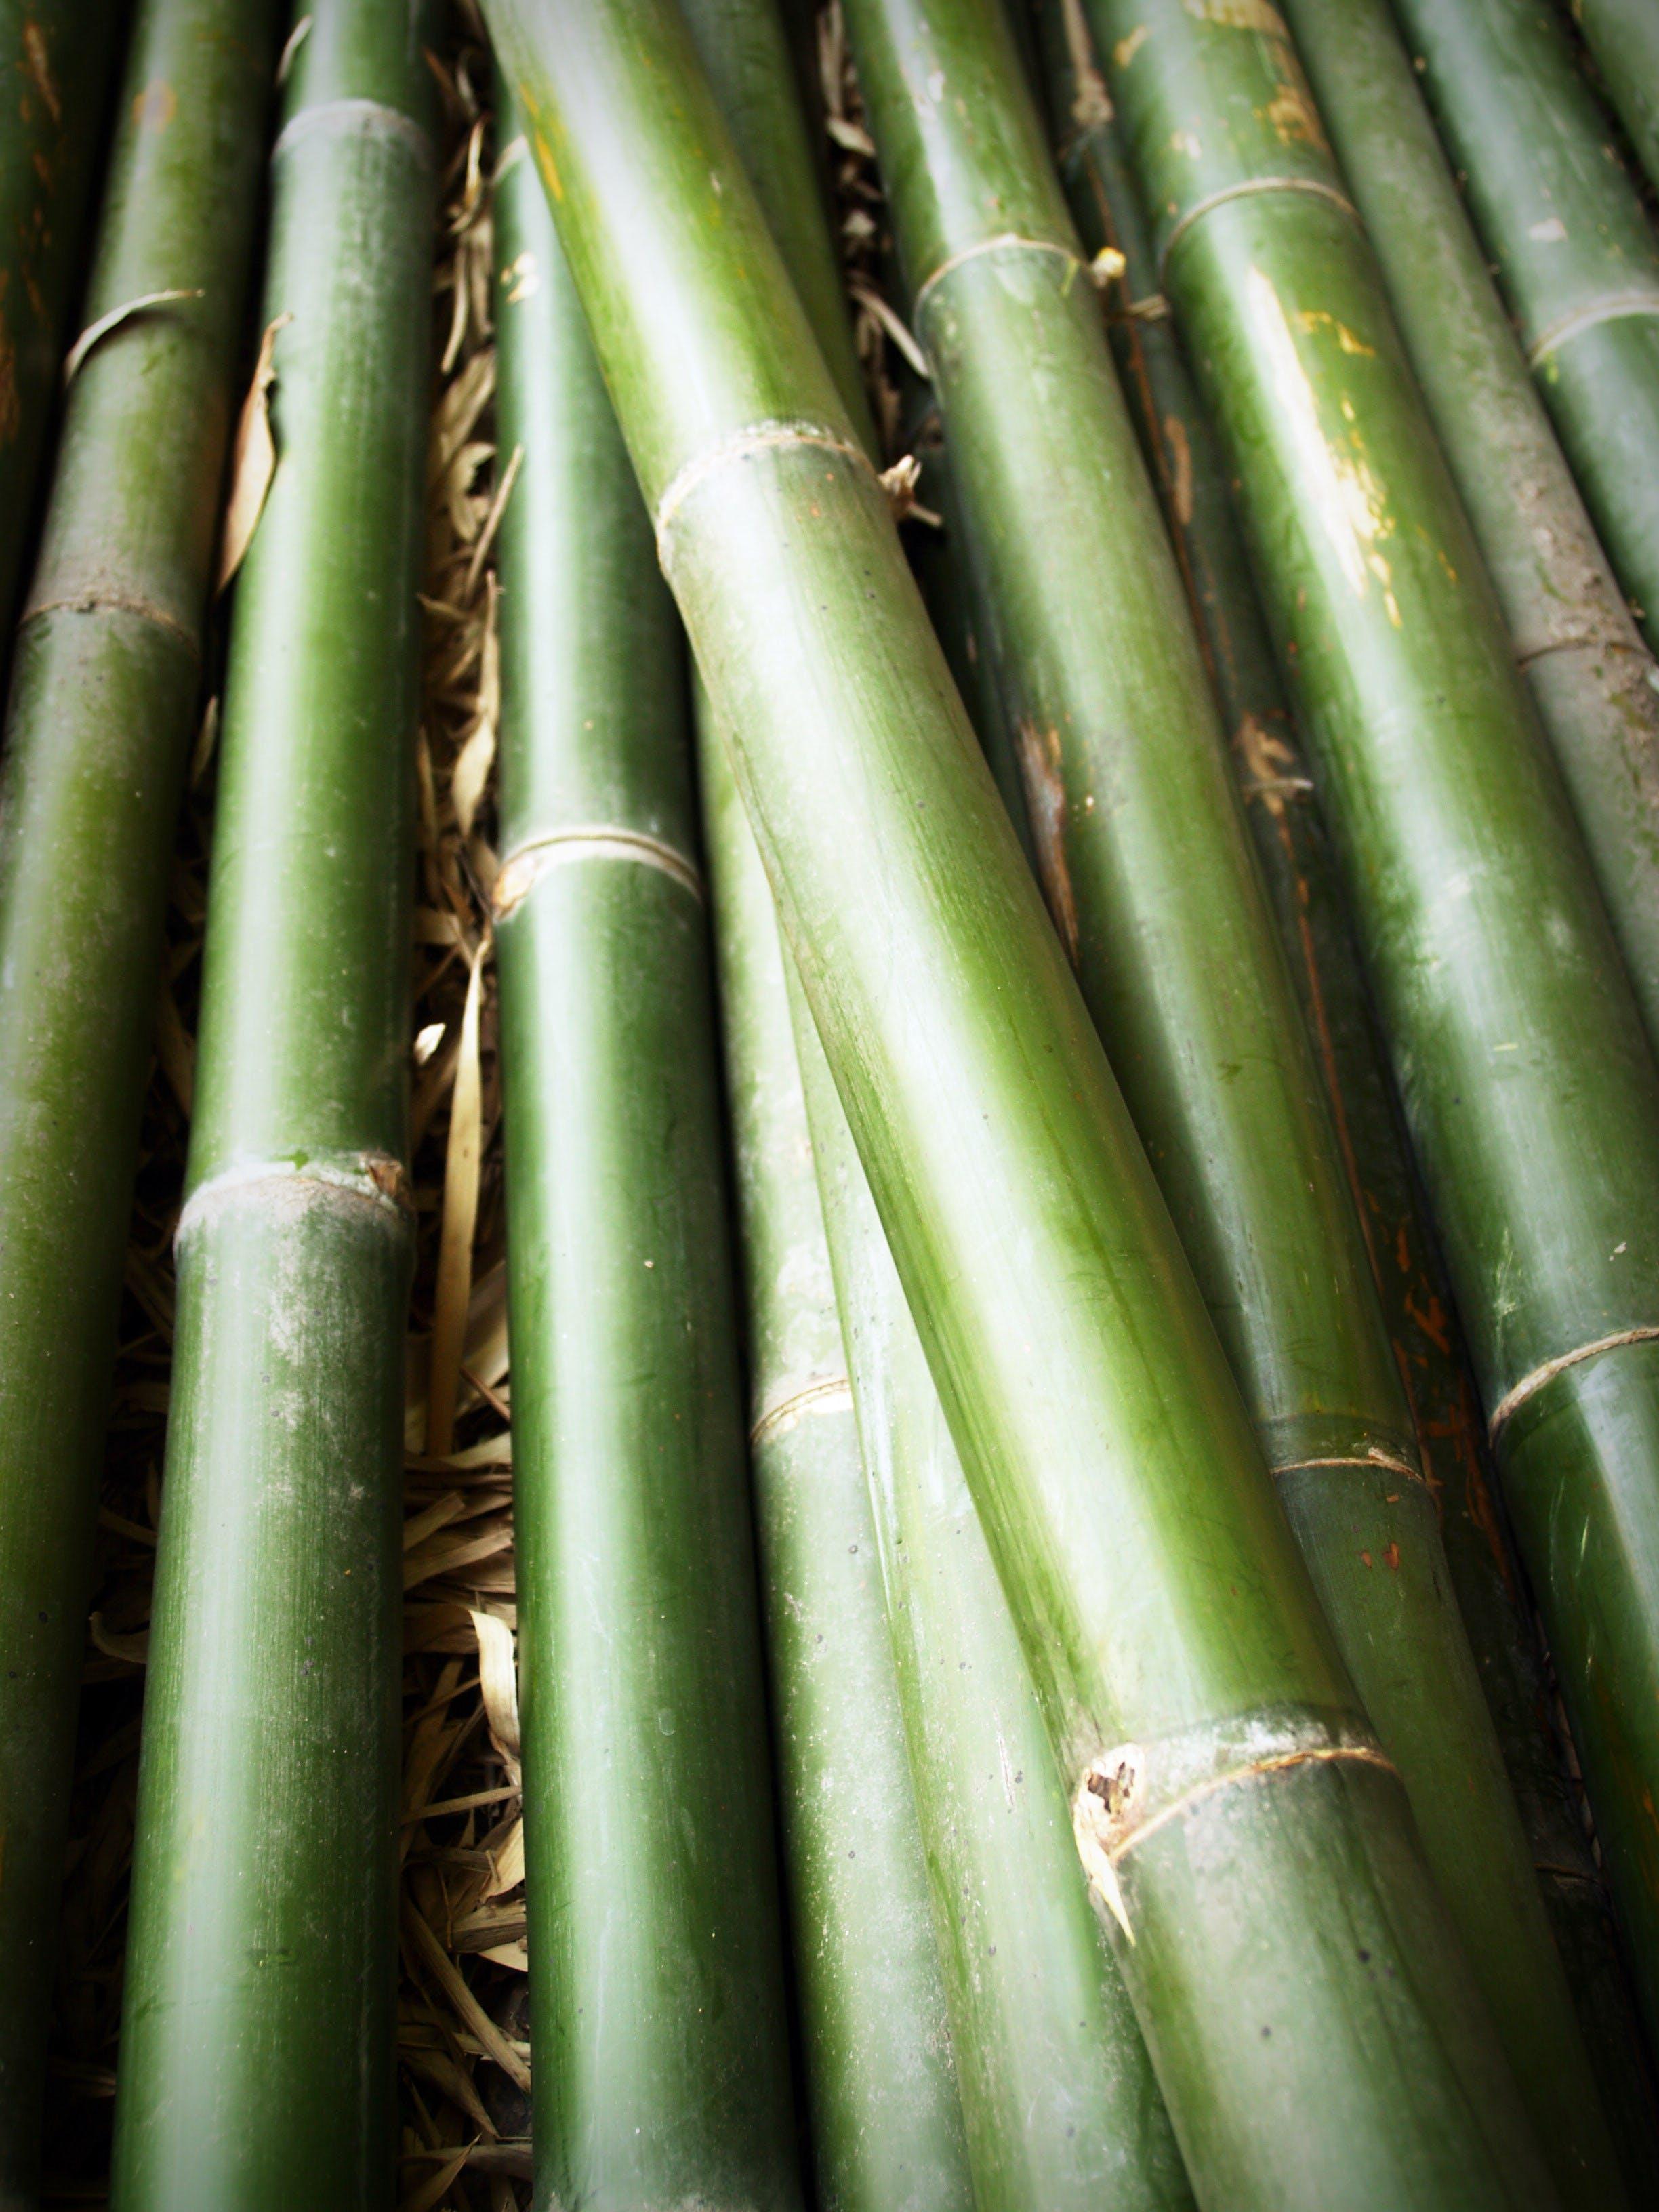 Green Bamboo Sticks